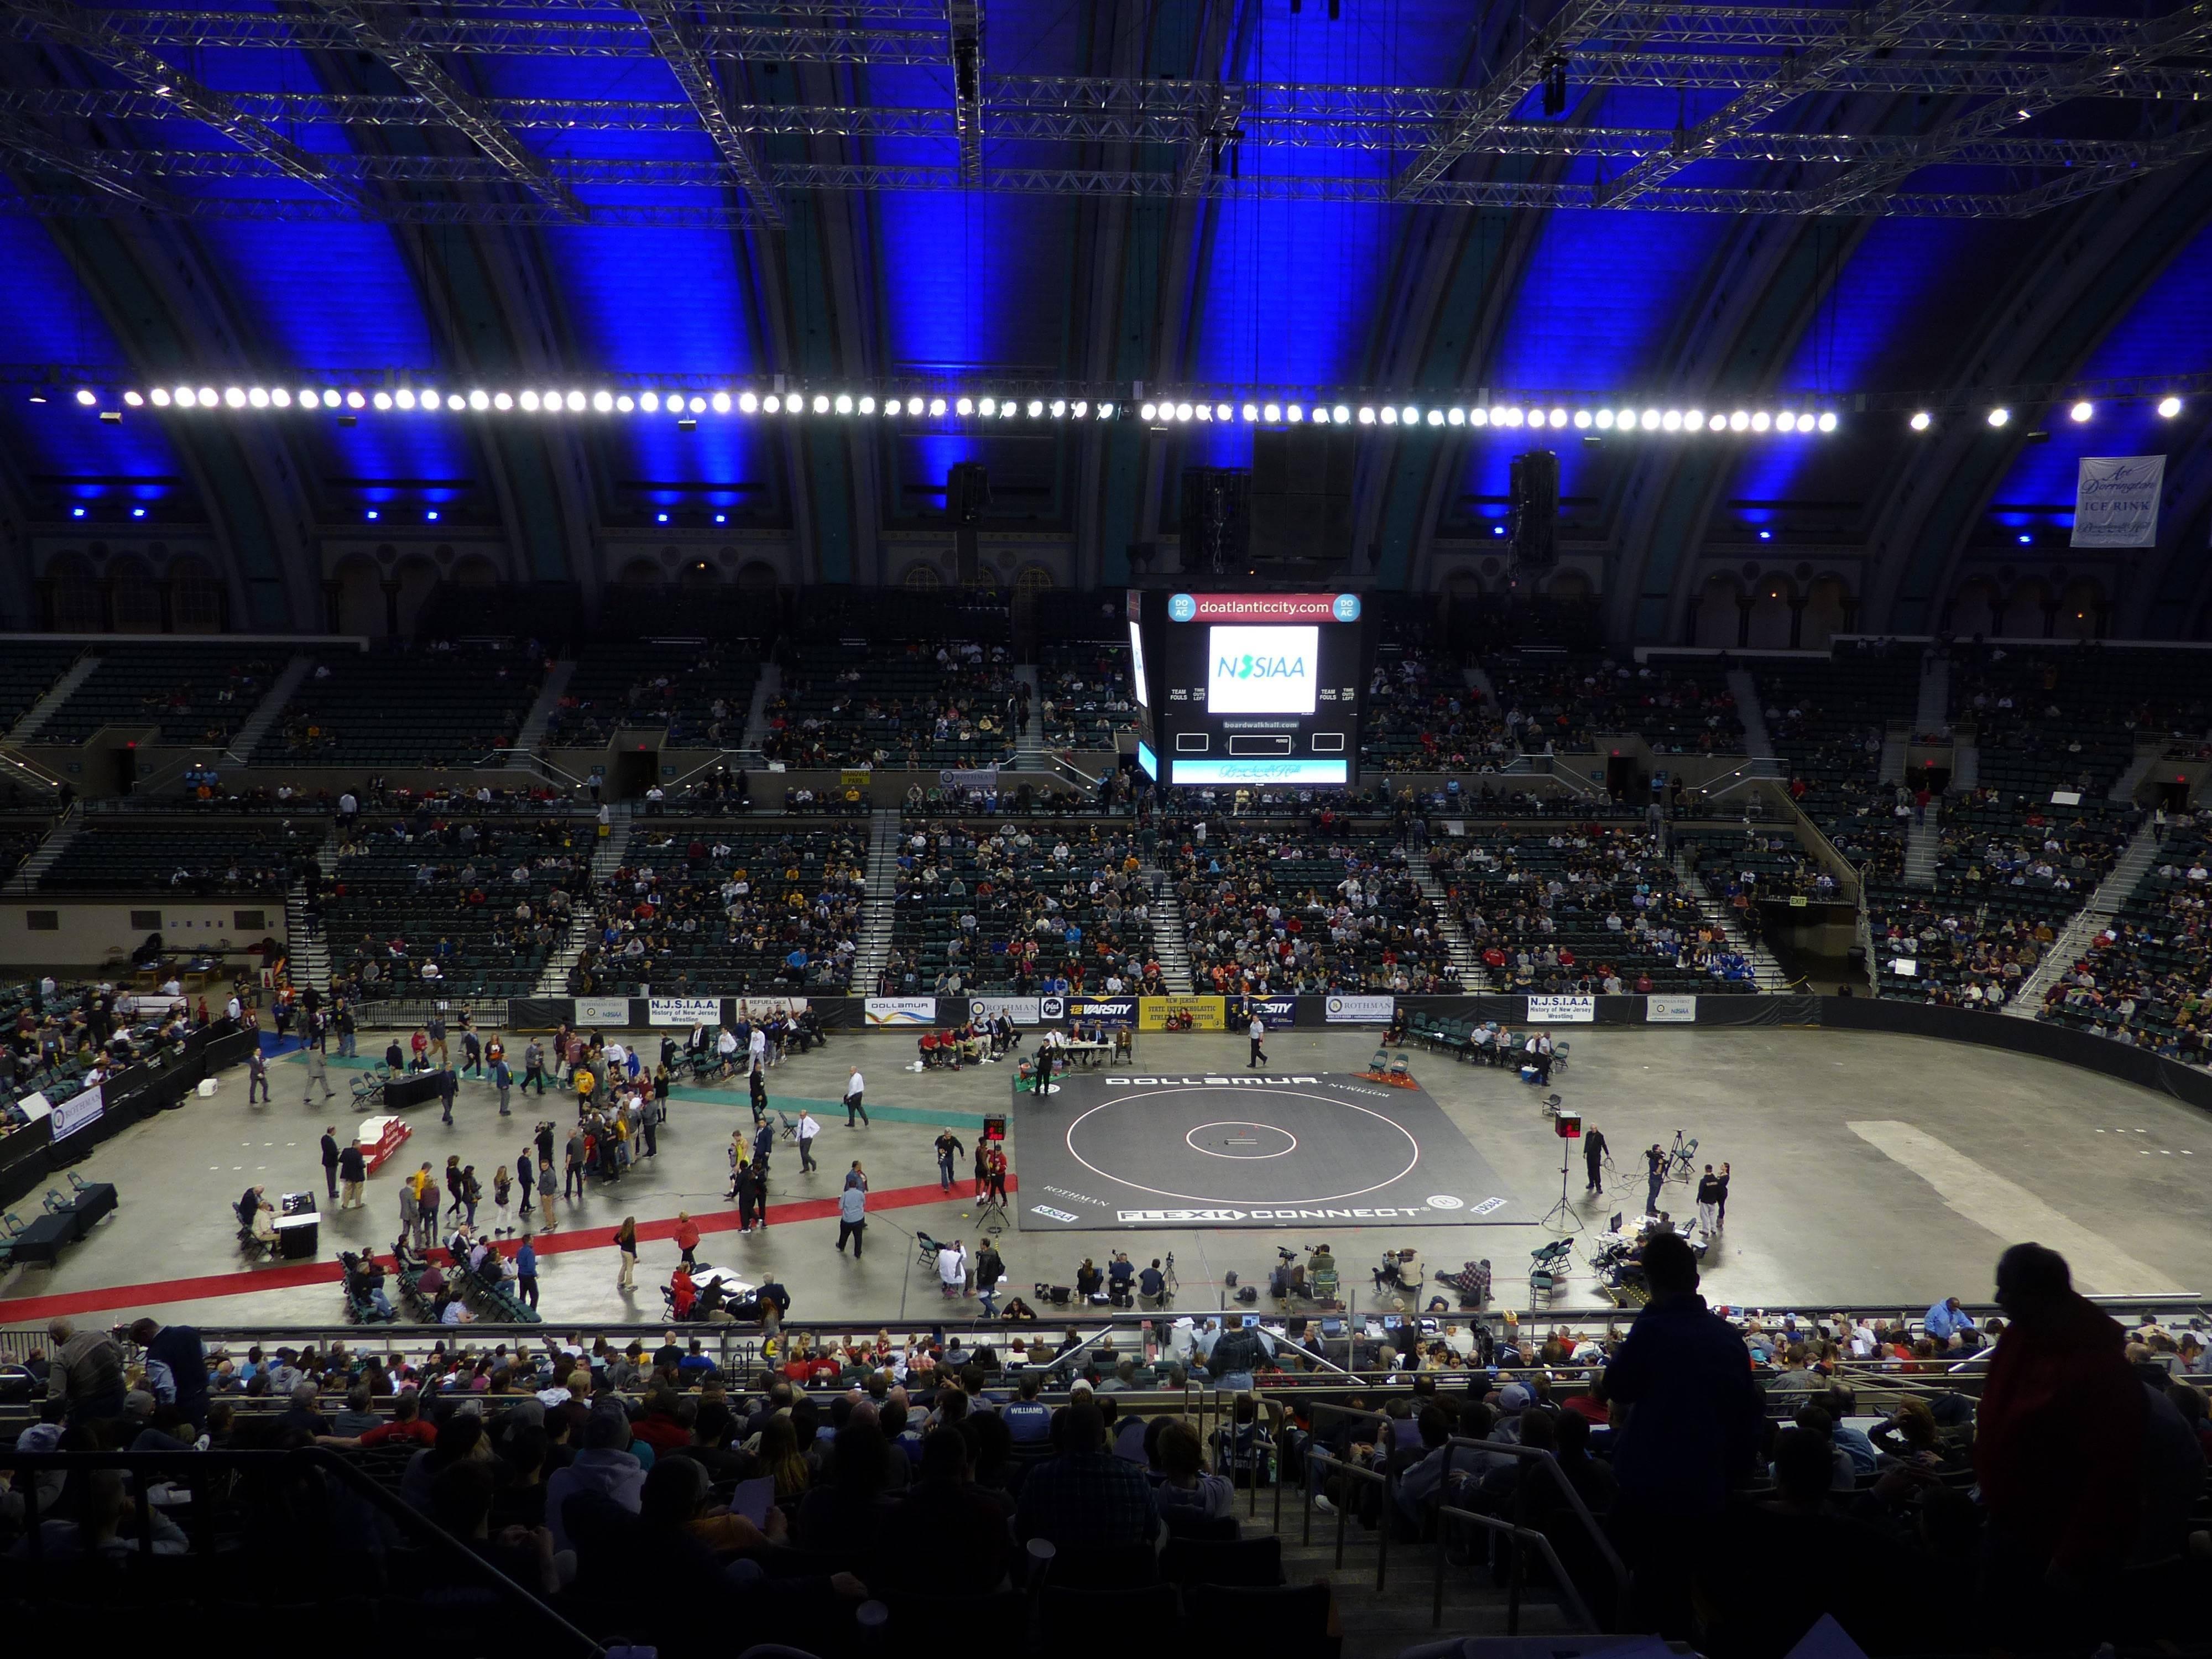 647e2c92138484996abb_b7541d403f579c7975cc_2017_NJSIAA_Wrestling_Championships.jpg